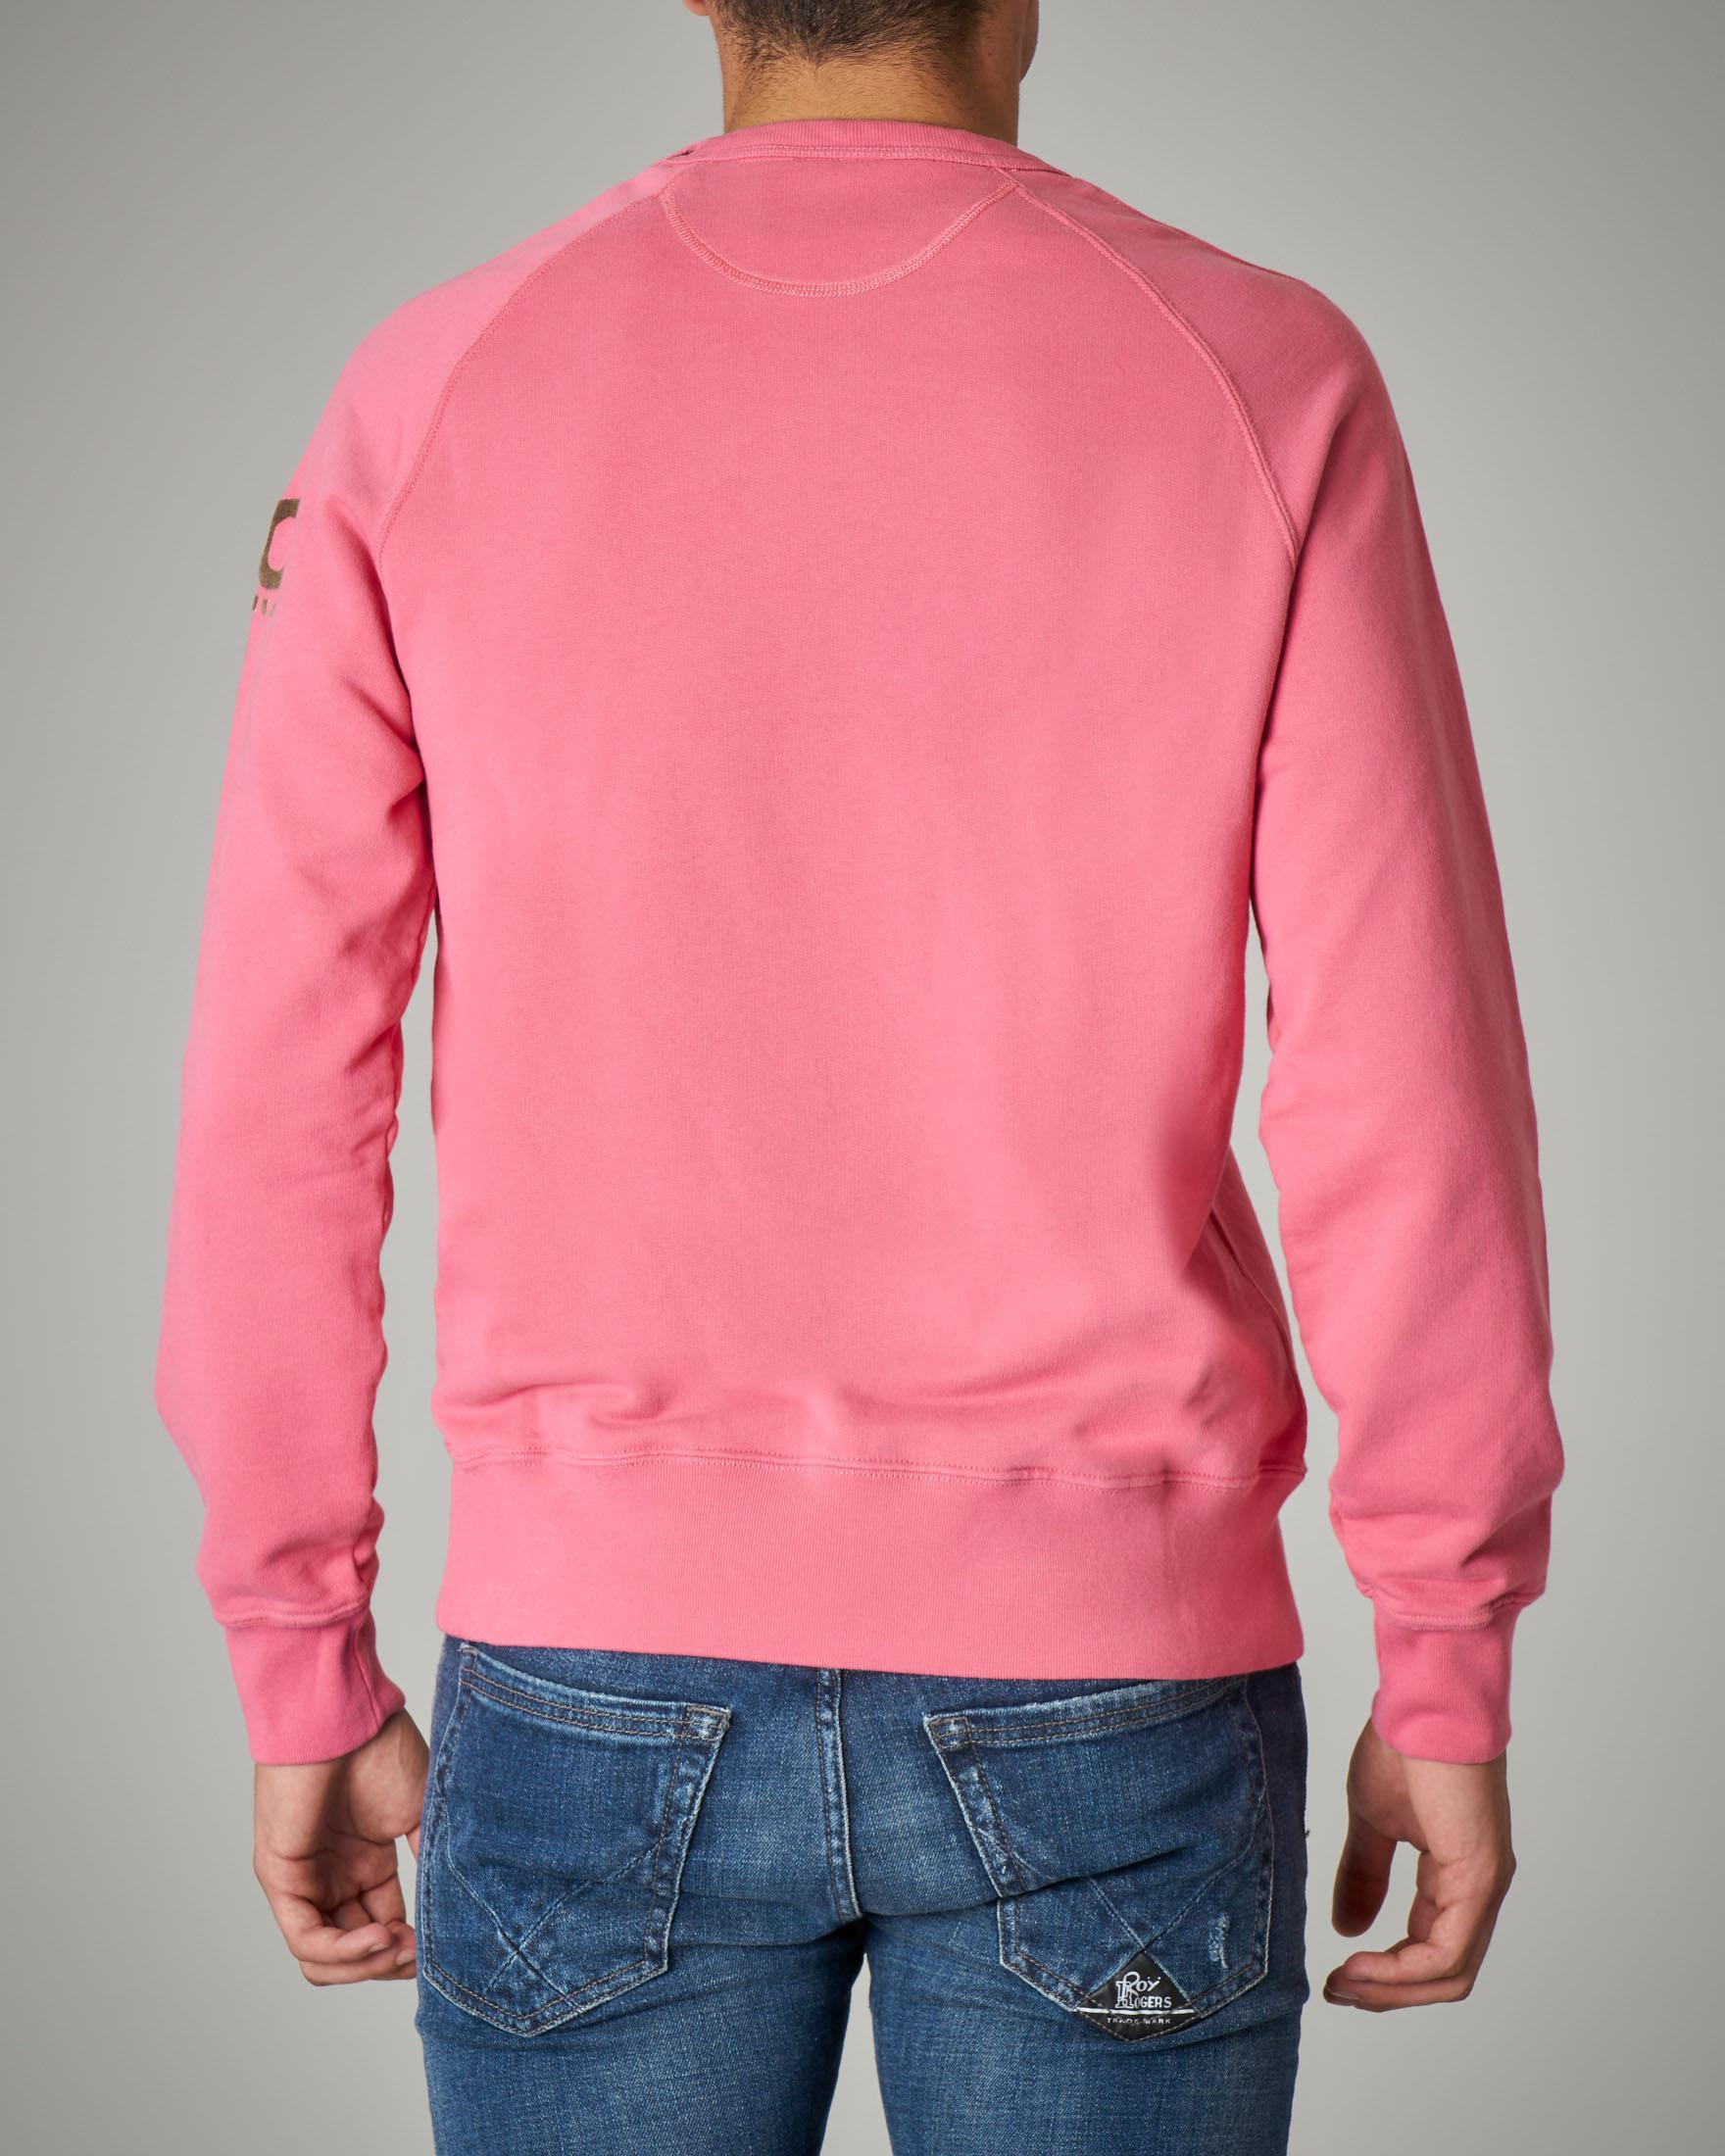 Felpa rosa girocollo in cotone